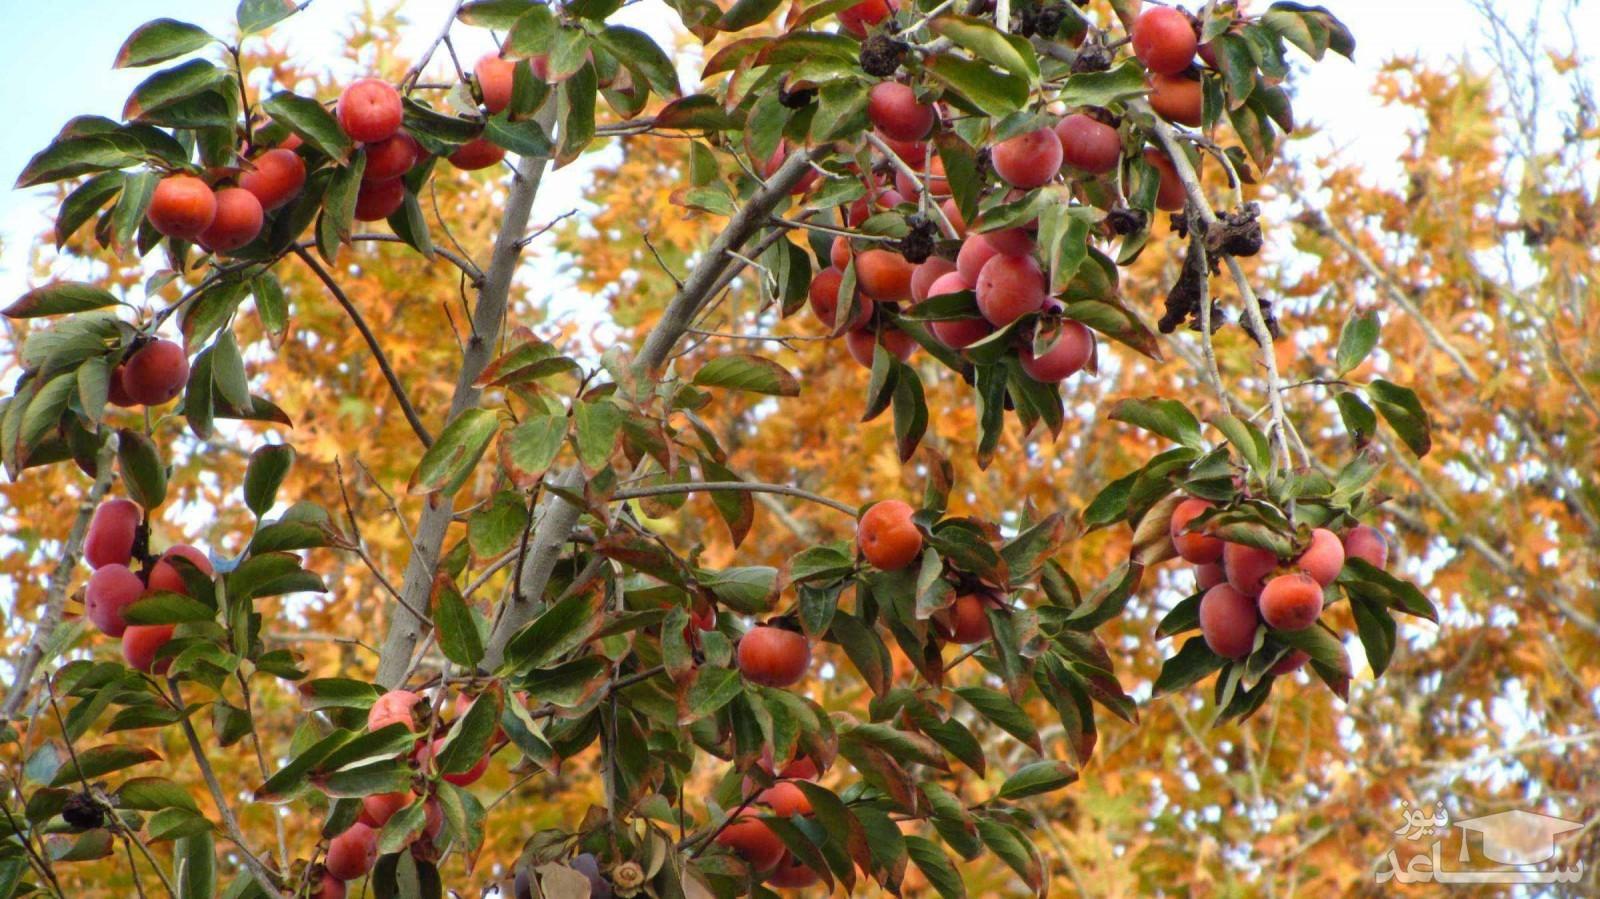 درخت خرمالو (نگهداری + پرورش)